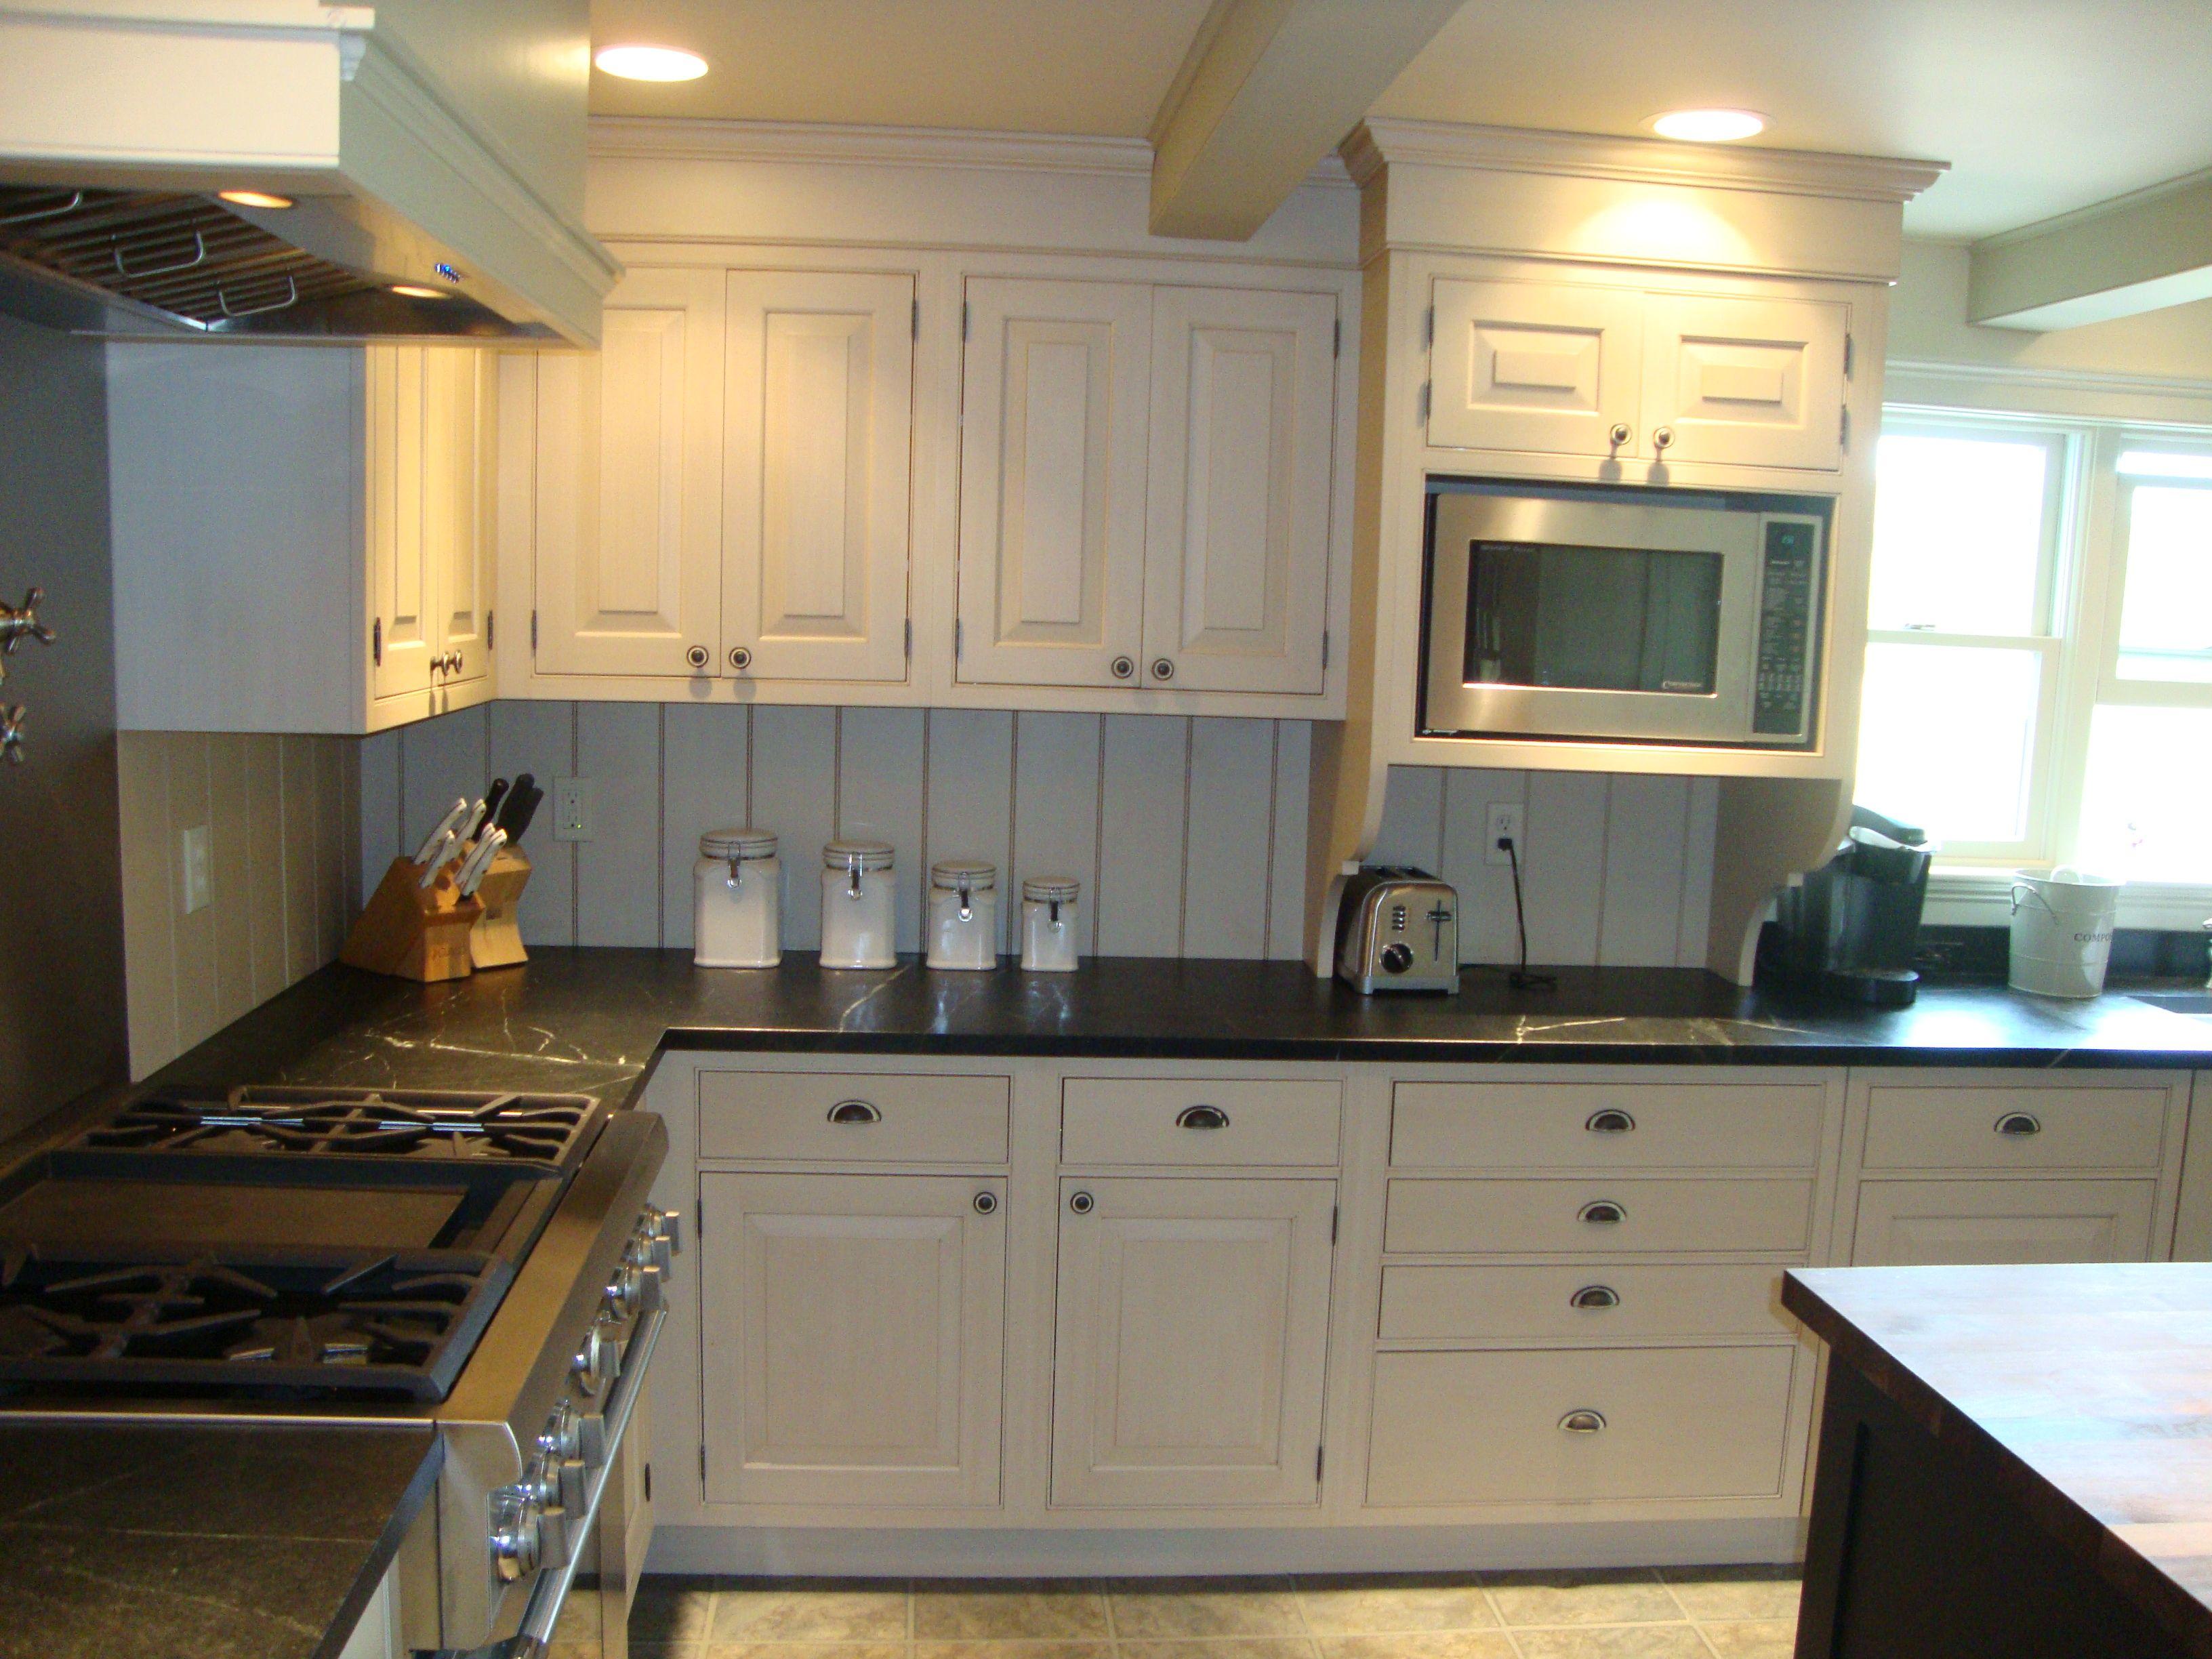 Breathtaking White Wooden Kitchen Cabinet Finished Also Black Granite Countertops Kitchen Cabinet Styles Modern Kitchen Cabinet Design Modern Kitchen Cabinets